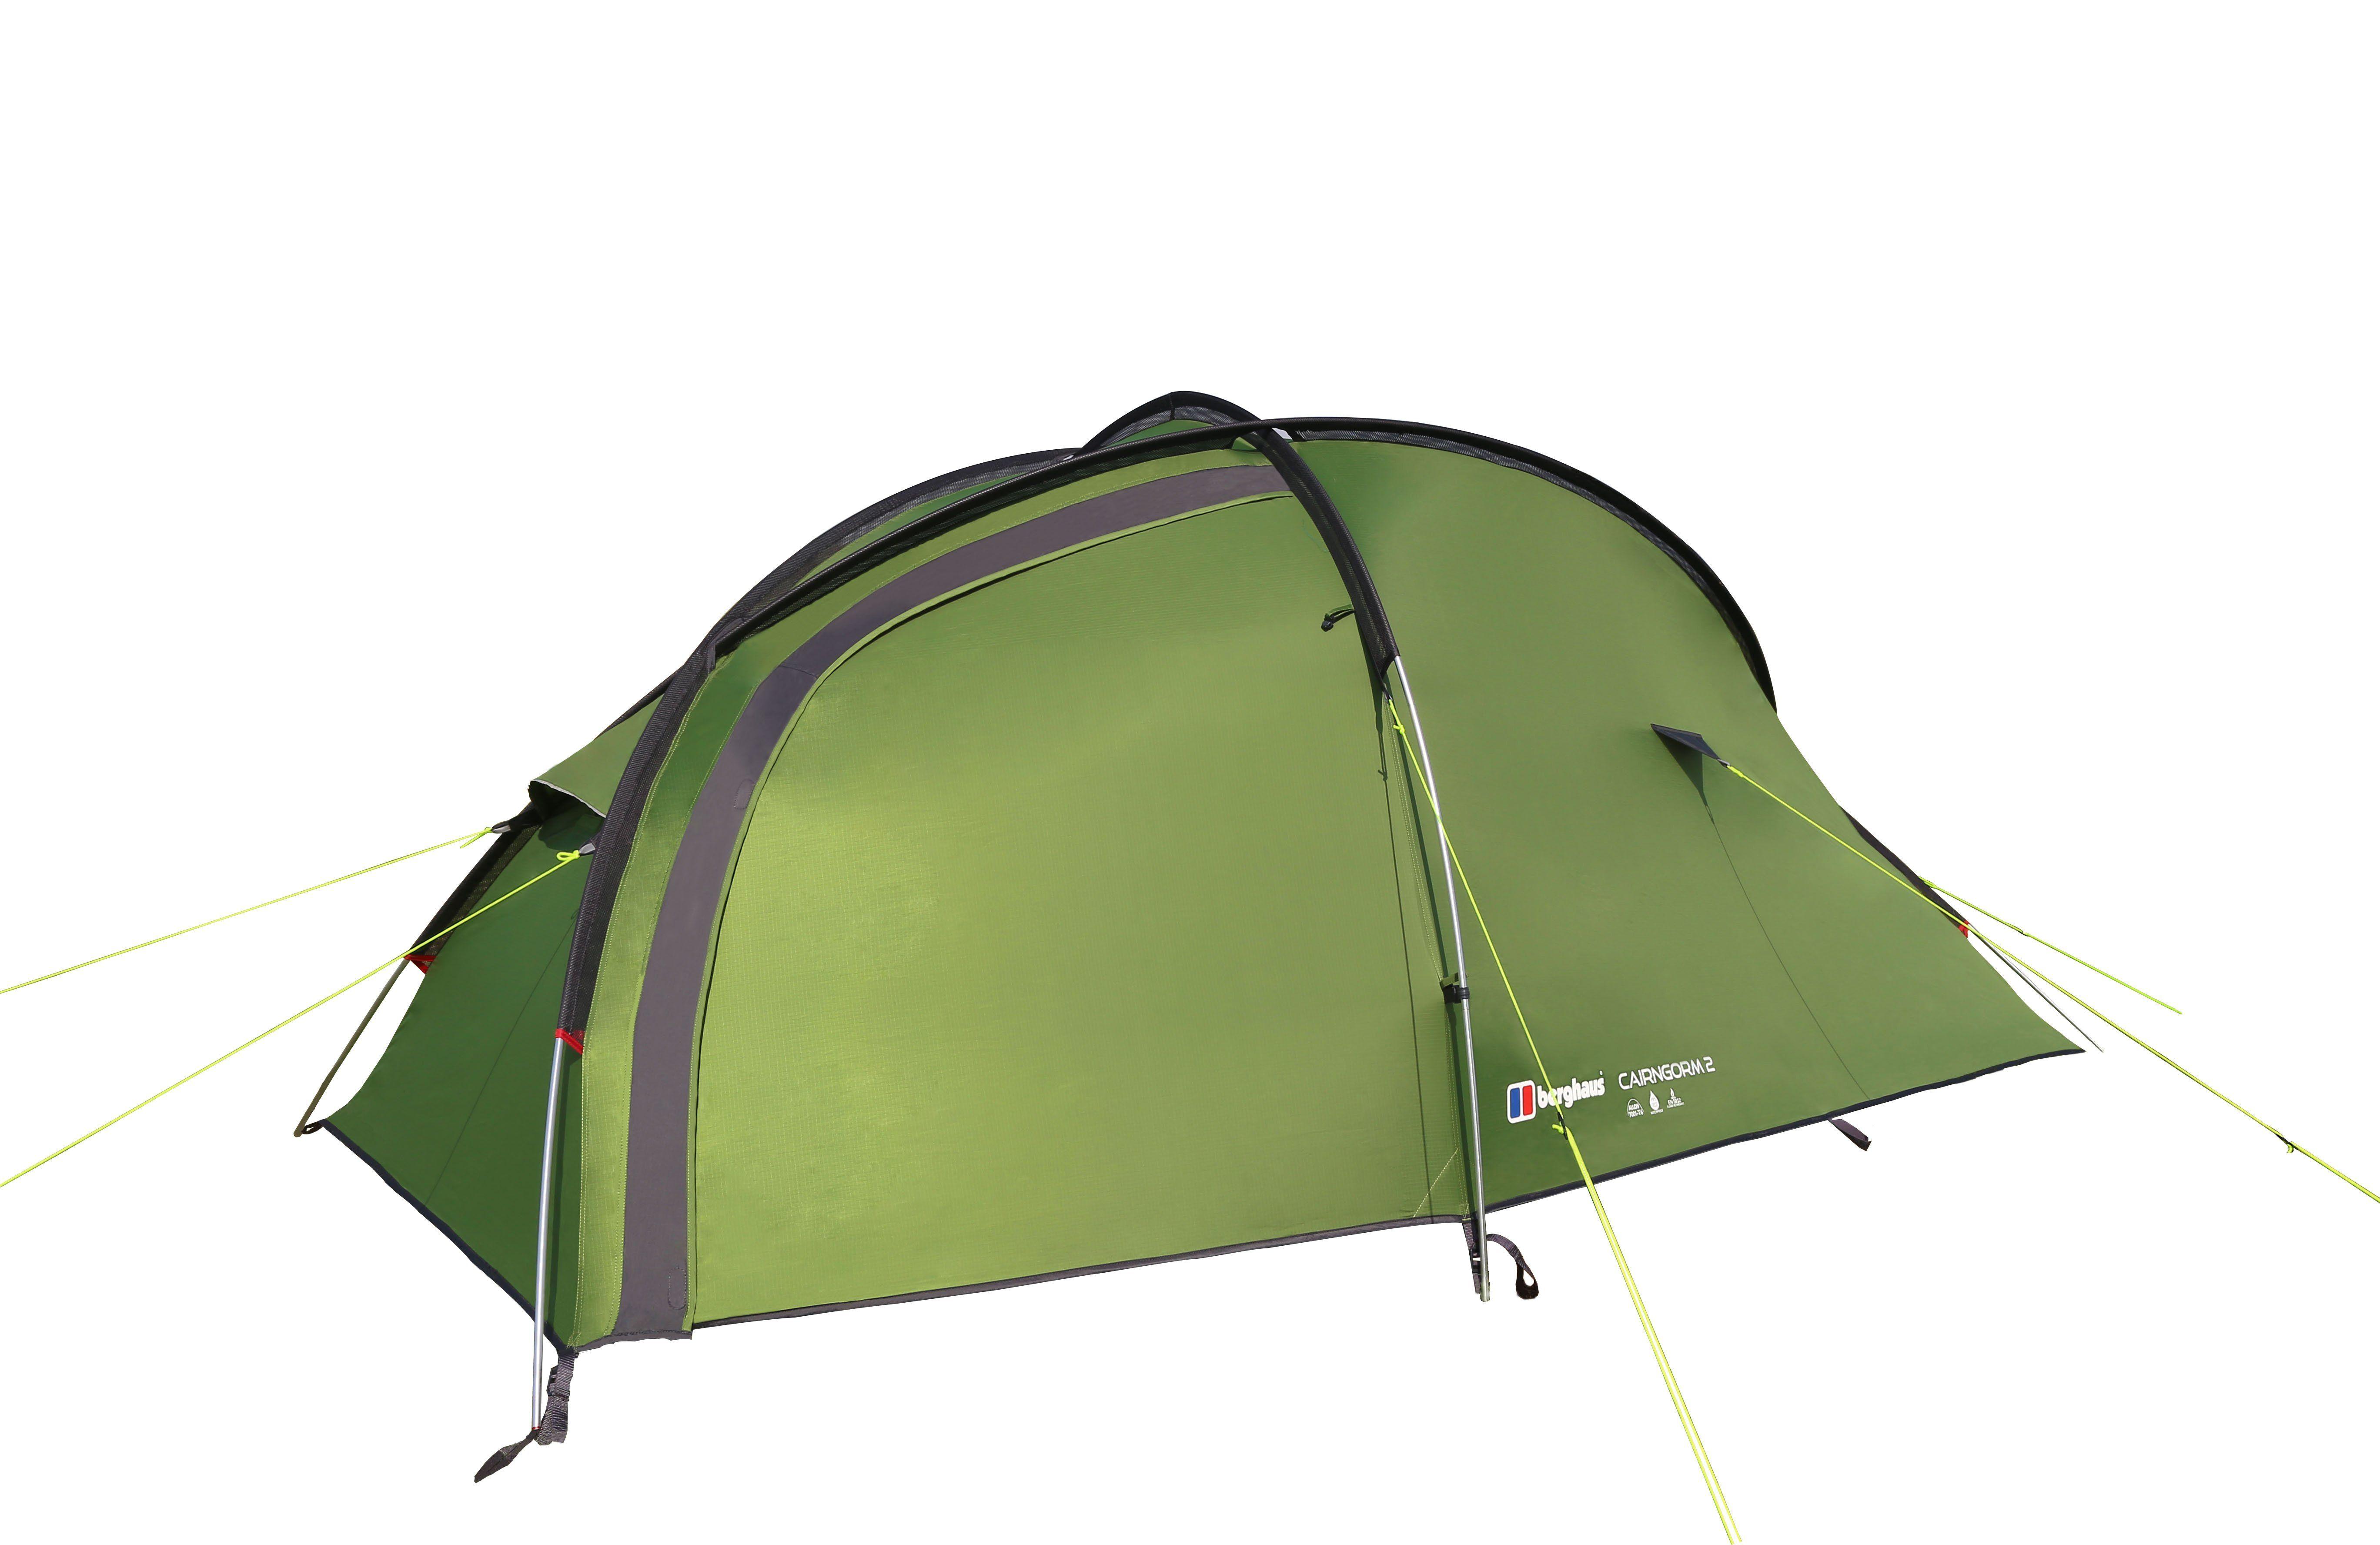 Berghaus Cairngorm 2 Person Tent